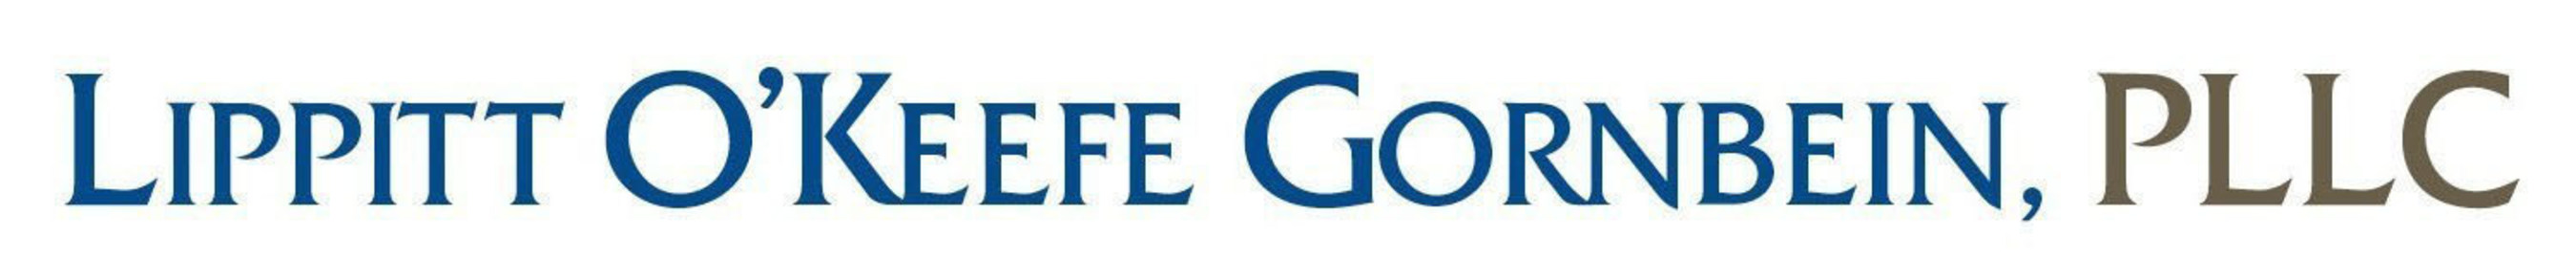 Lippitt O'Keefe Gornbein, PLLC logo